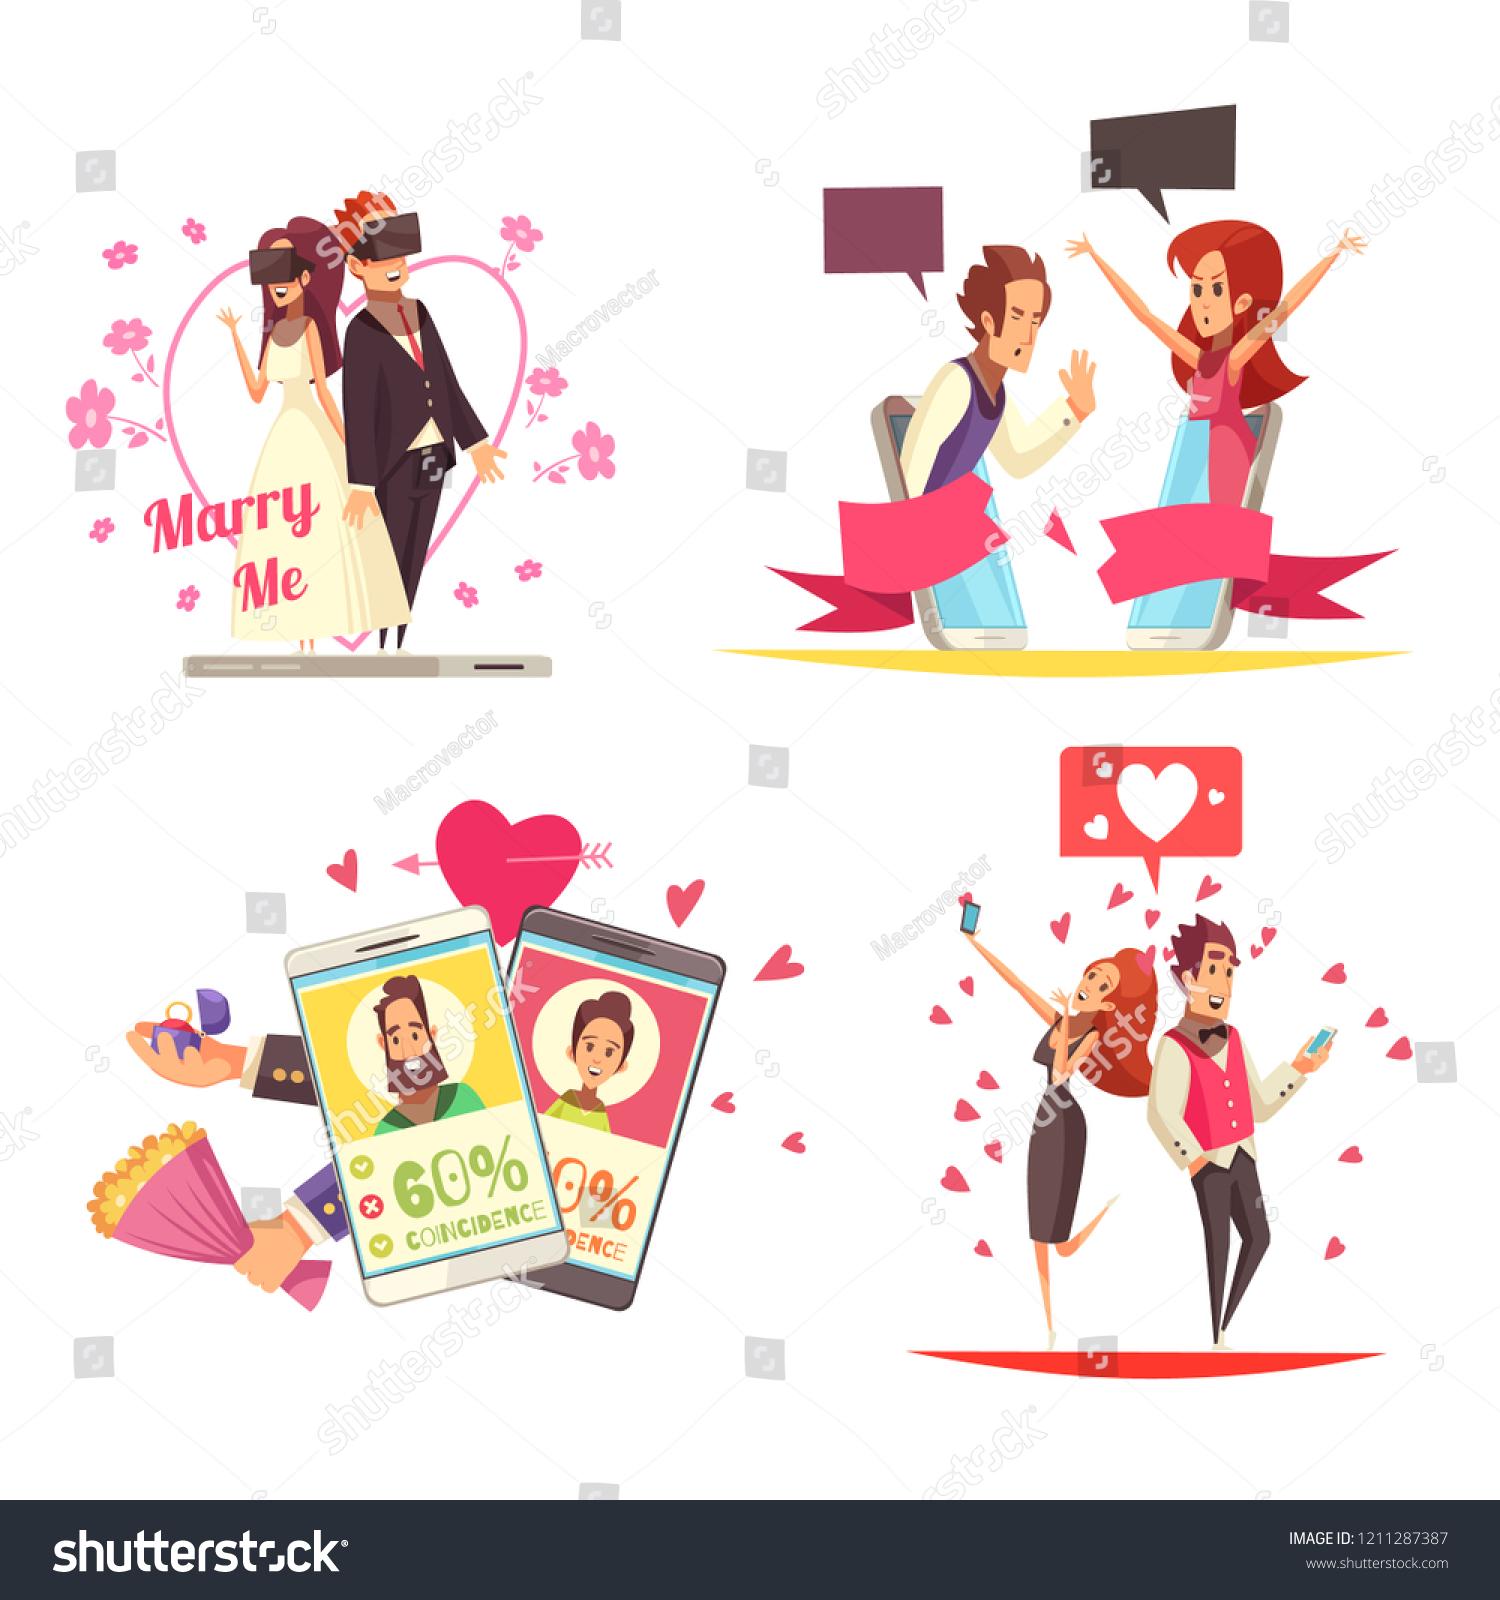 interracial dating concerns